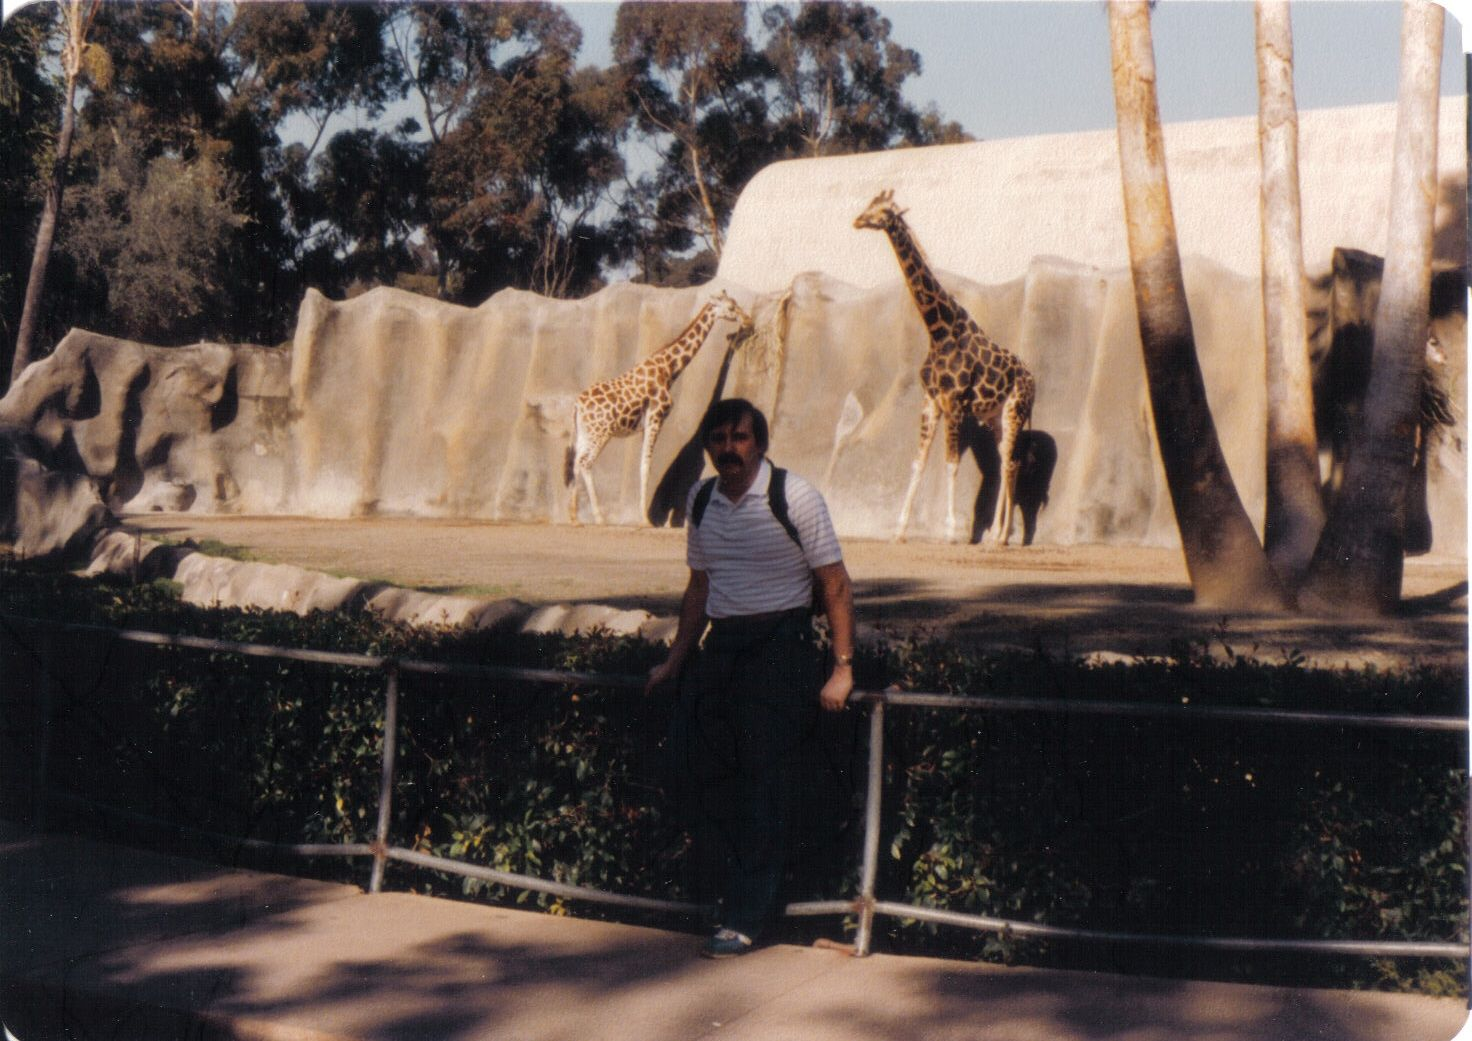 Giraffe enclosure, 1984